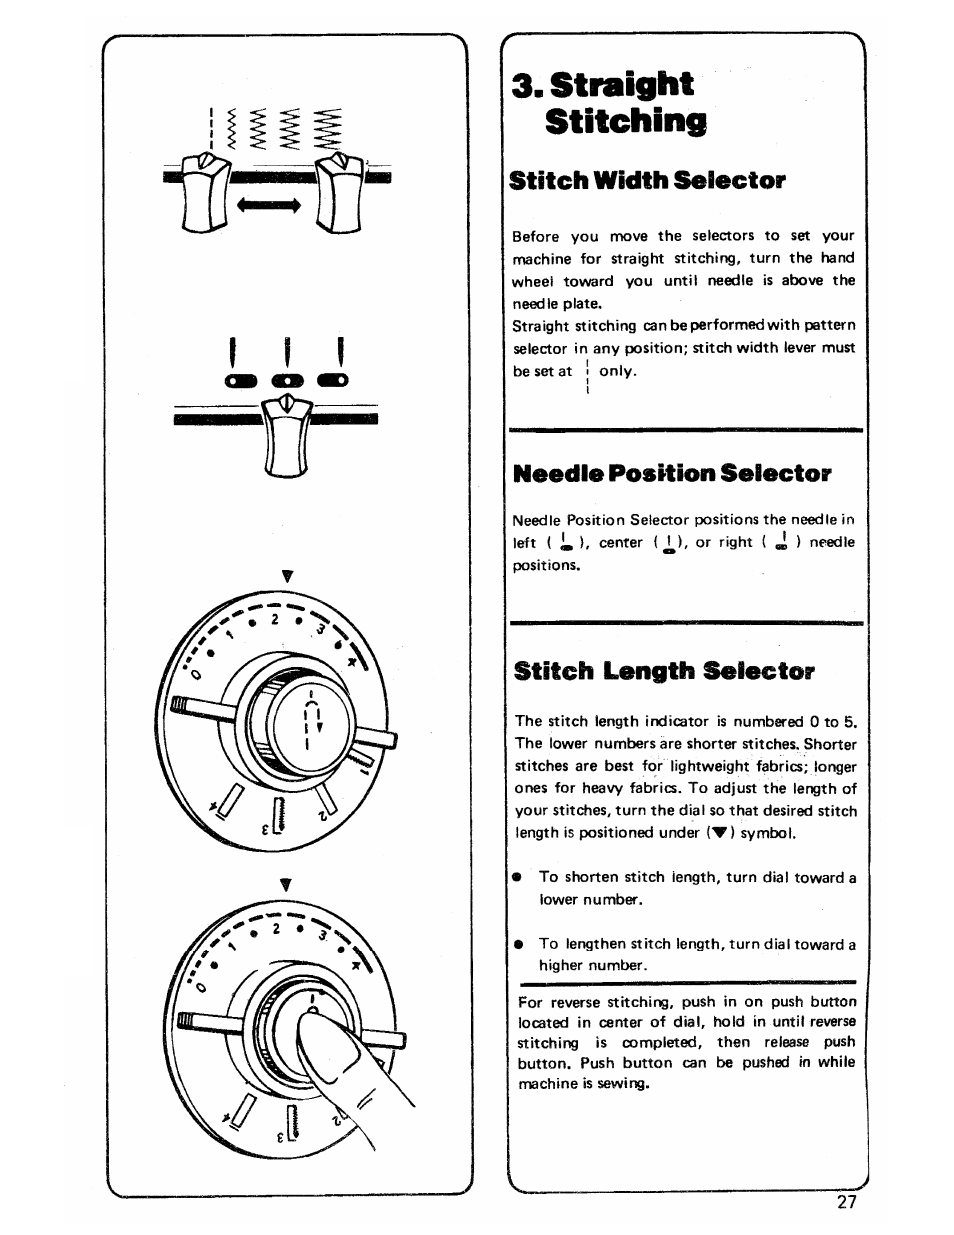 Straight stitching, Stitch width selector, Stitch length